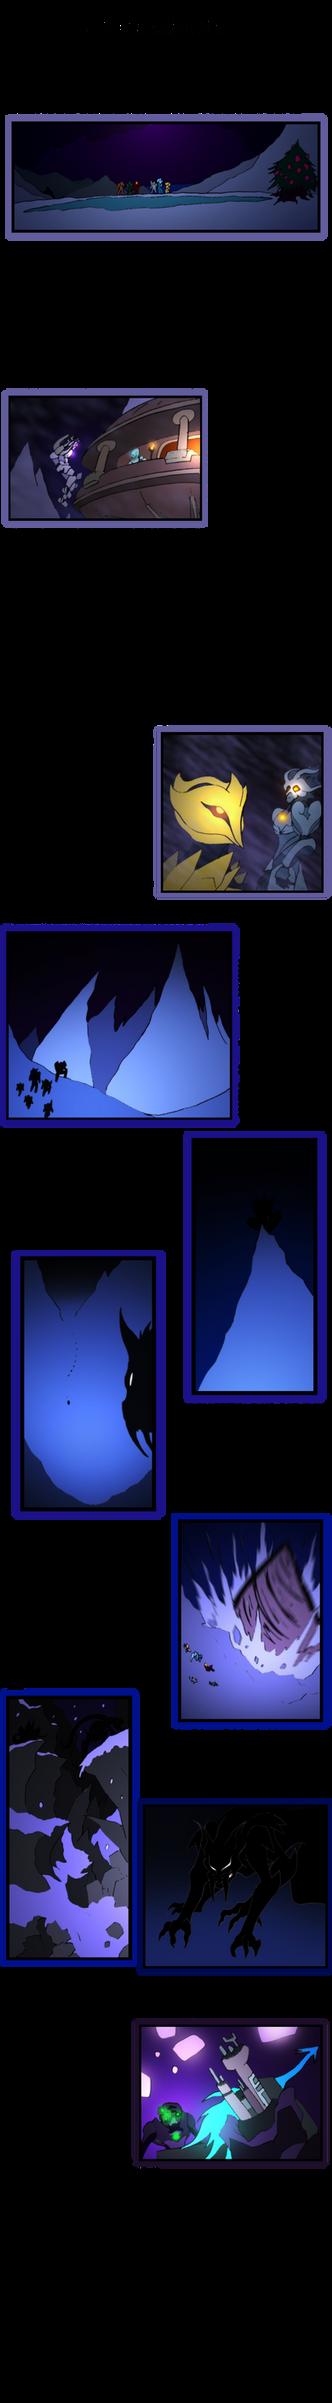 Bionicle- Nova Orbis- Mystery- Chapter 18